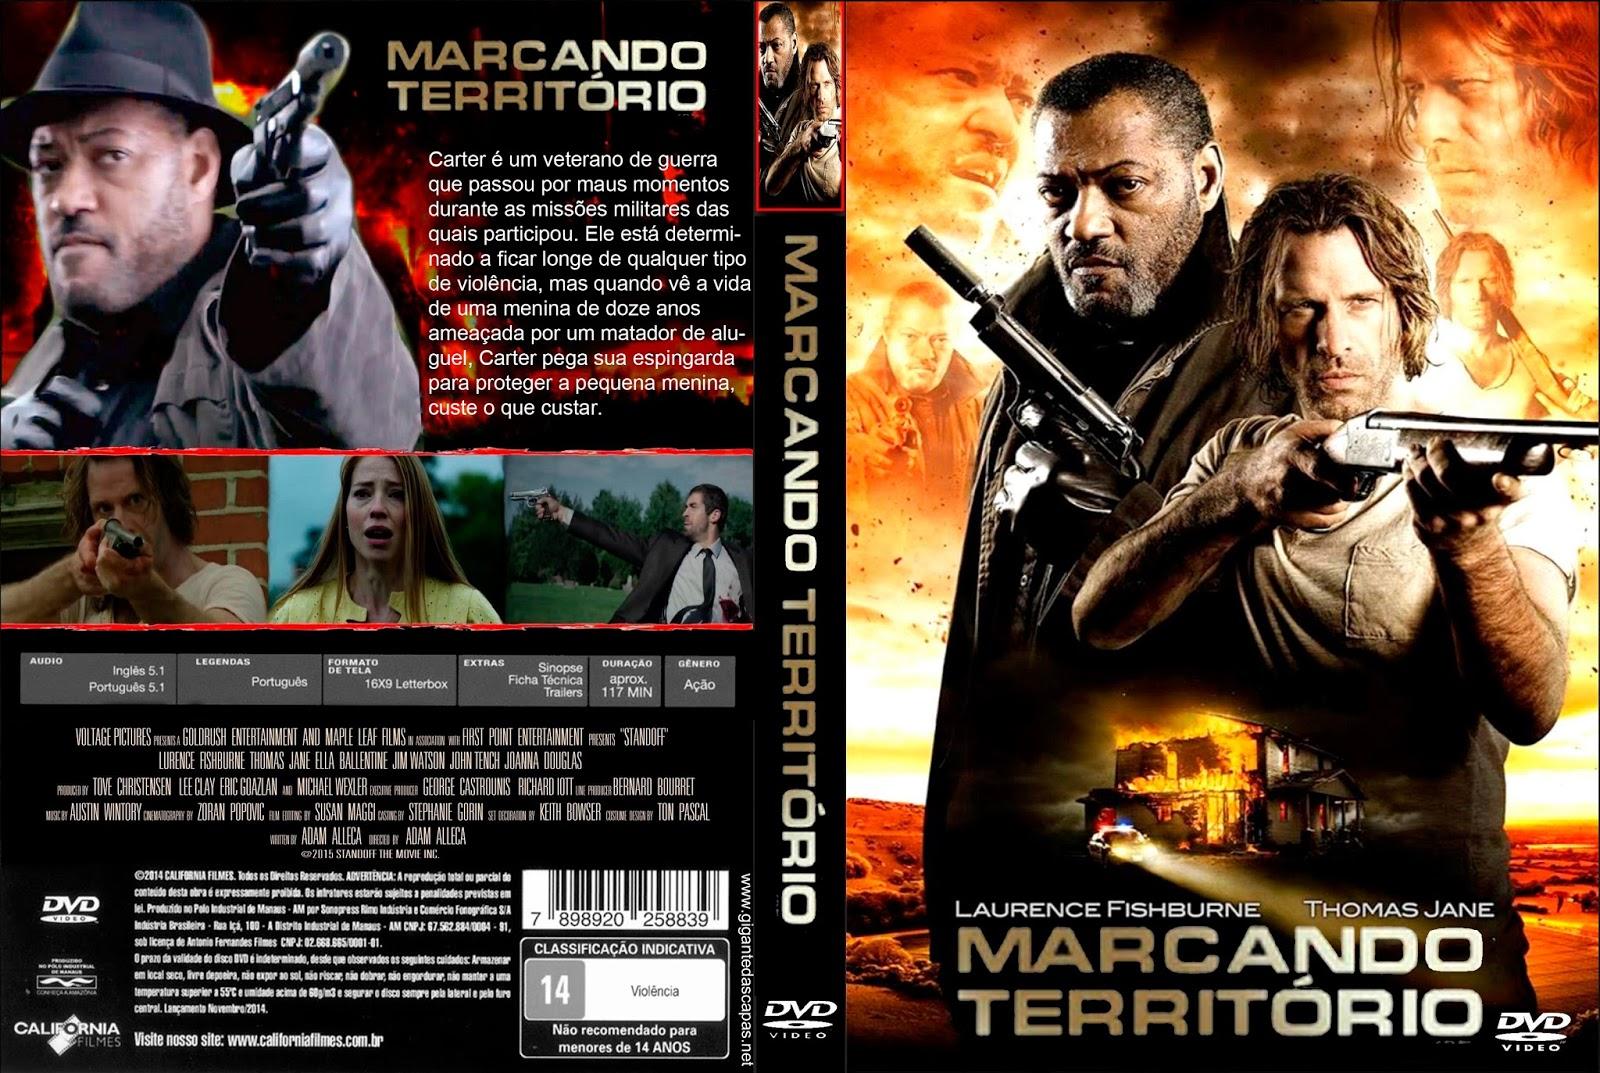 Marcando Território DVDRip XviD Dual Áudio Marcando Territ C3 B3rio   Capa Filme DVD